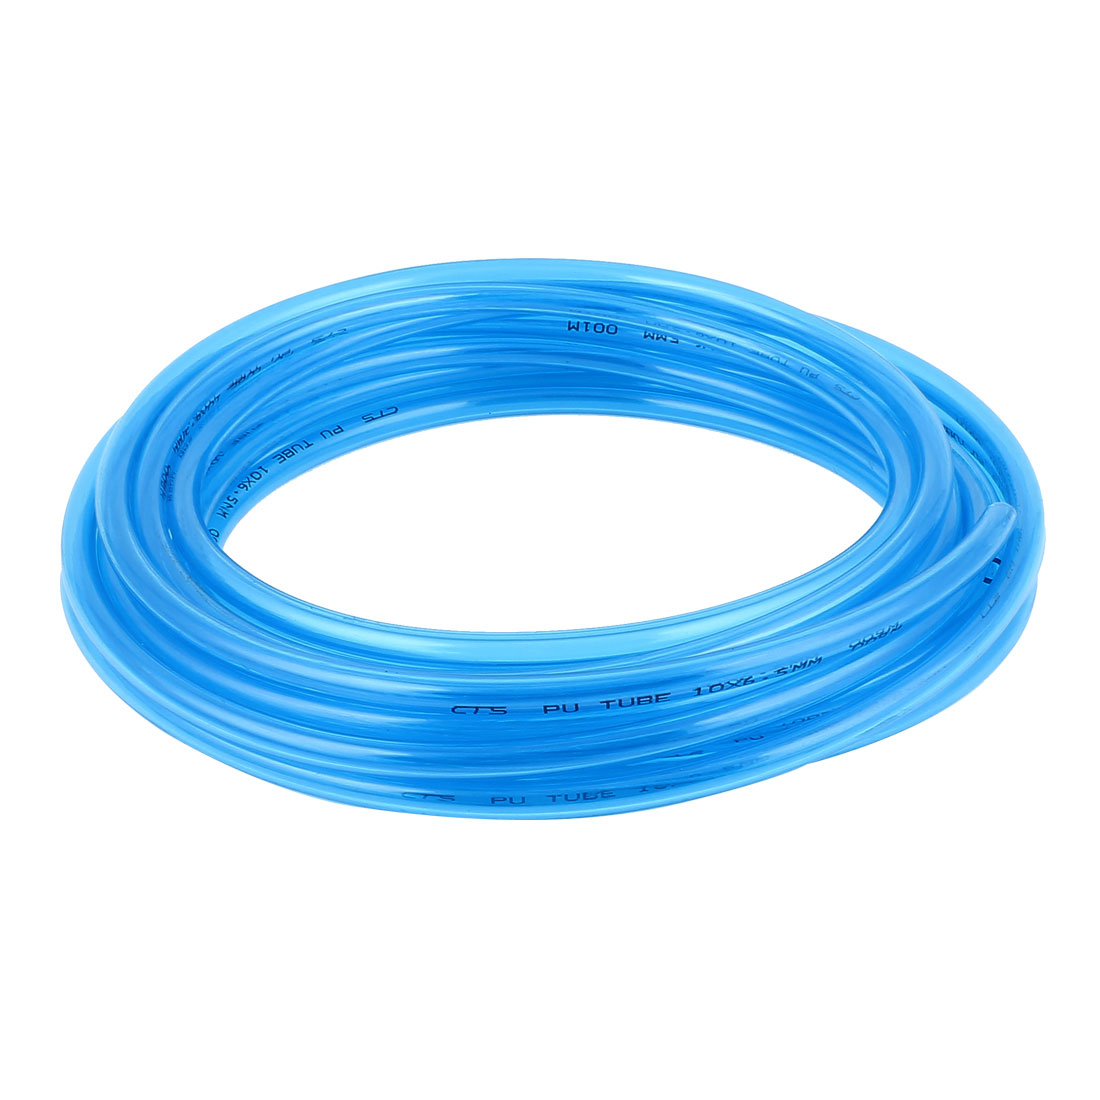 10mm x 6.5mm Clear Blue Fleaxible PU Tube Pneumatic Polyurethane Hose 9M Long